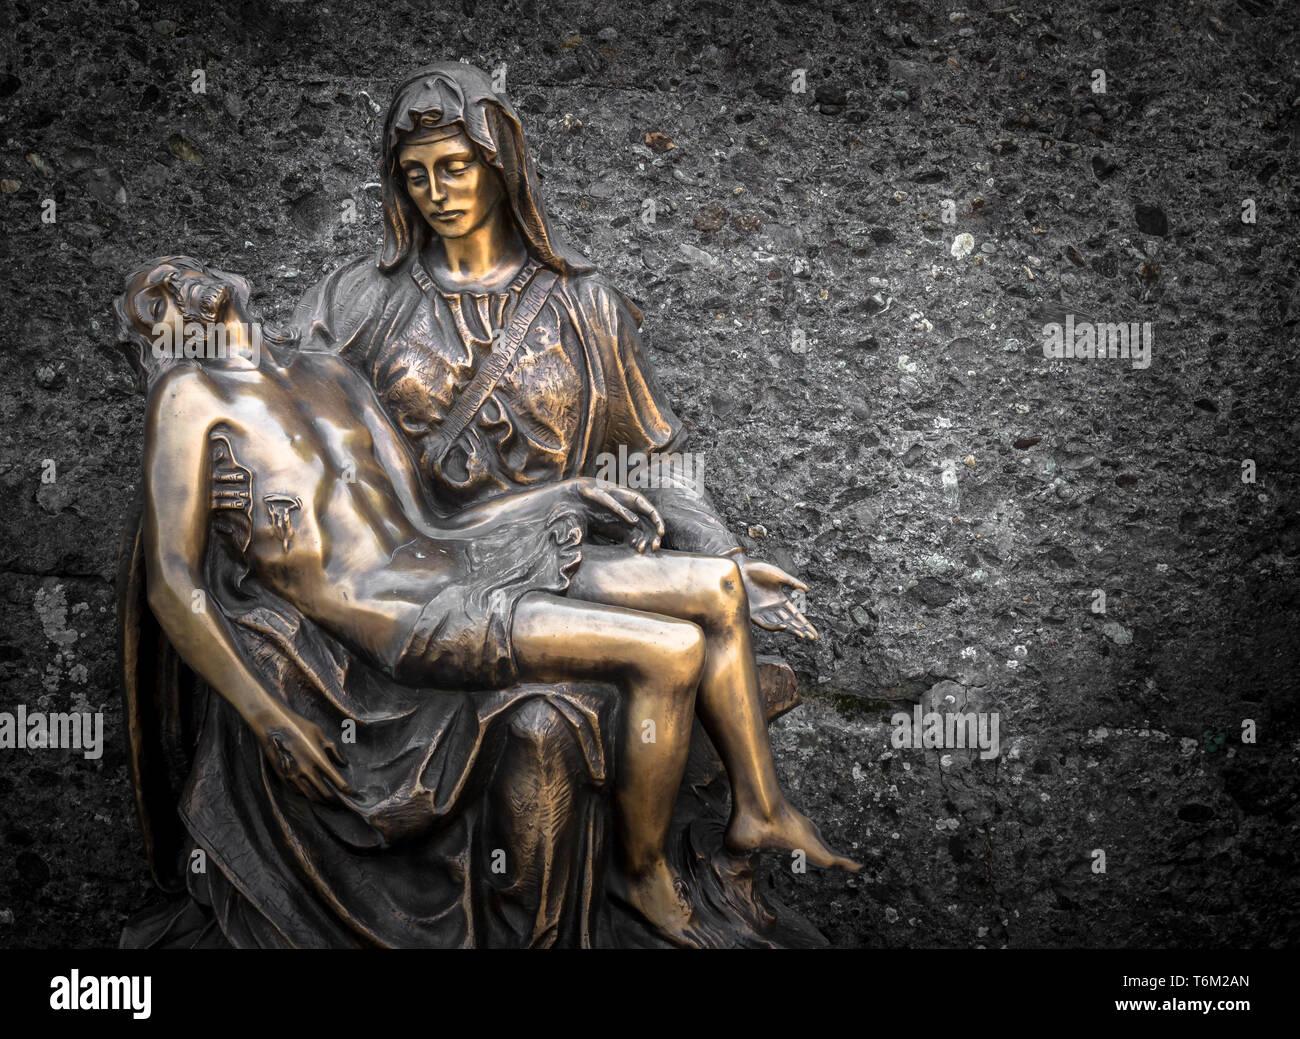 Religious bronze statue representing the piety of Michelangelo - Stock Image